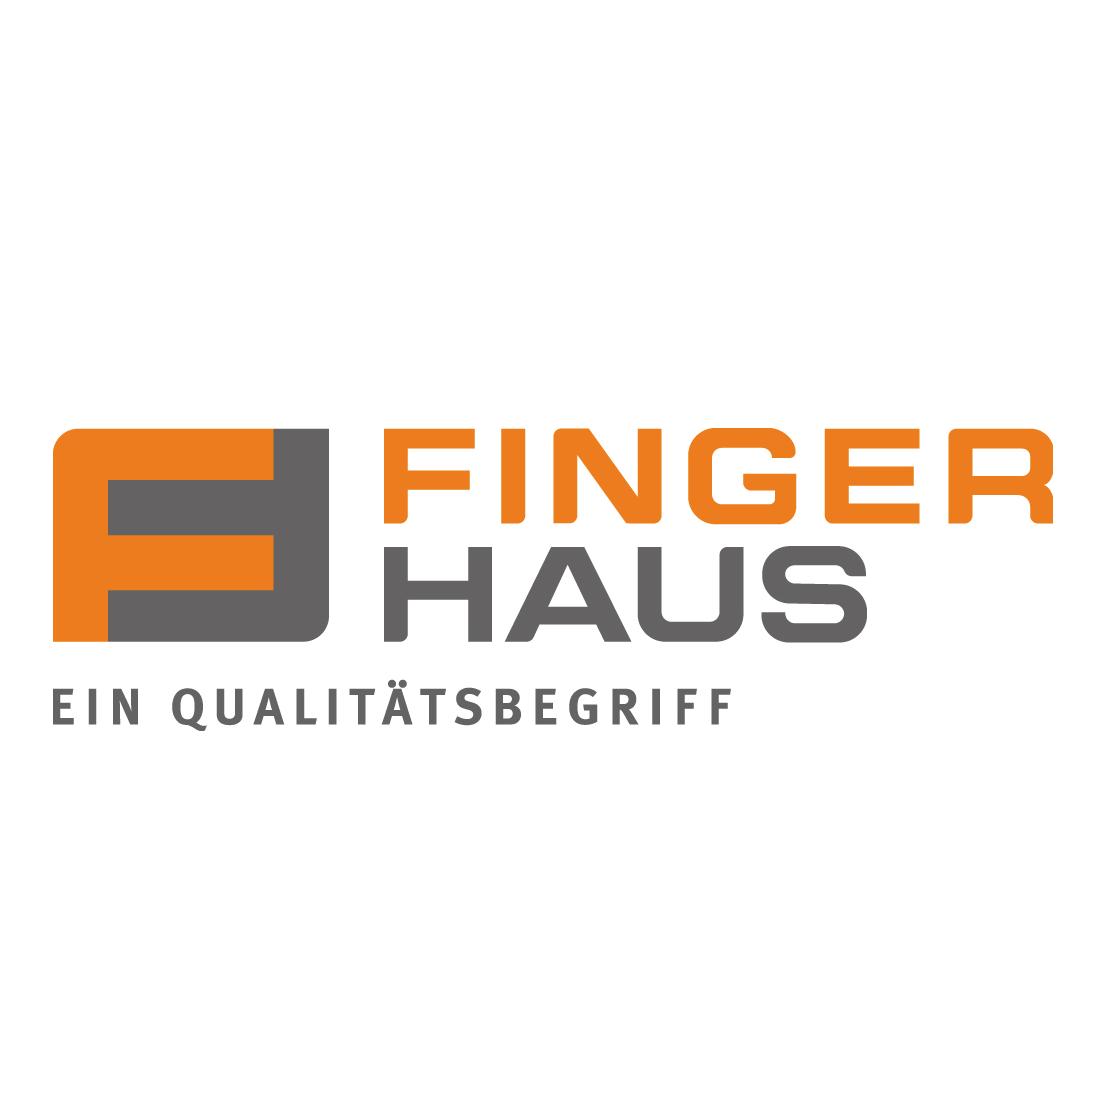 FingerHaus GmbH - Musterhaus Wuppertal